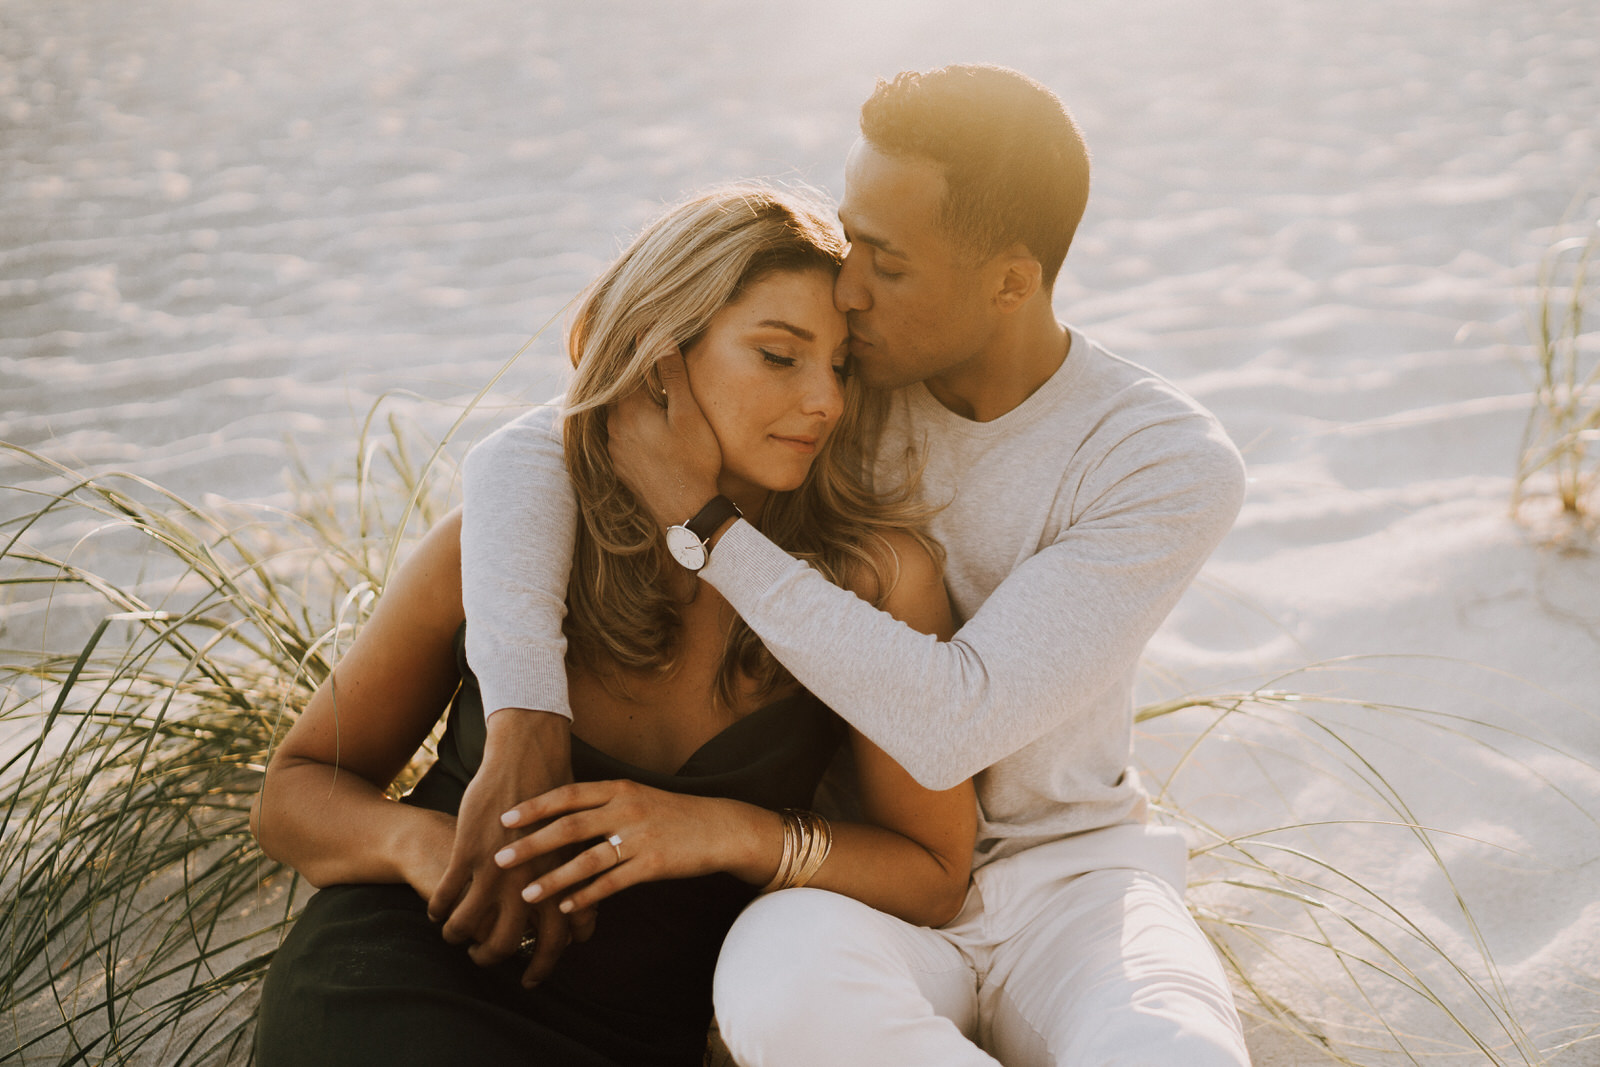 Naples 5th Ave Engagement Photos- Michelle Gonzalez Photography- Michele + Troy-267.JPG